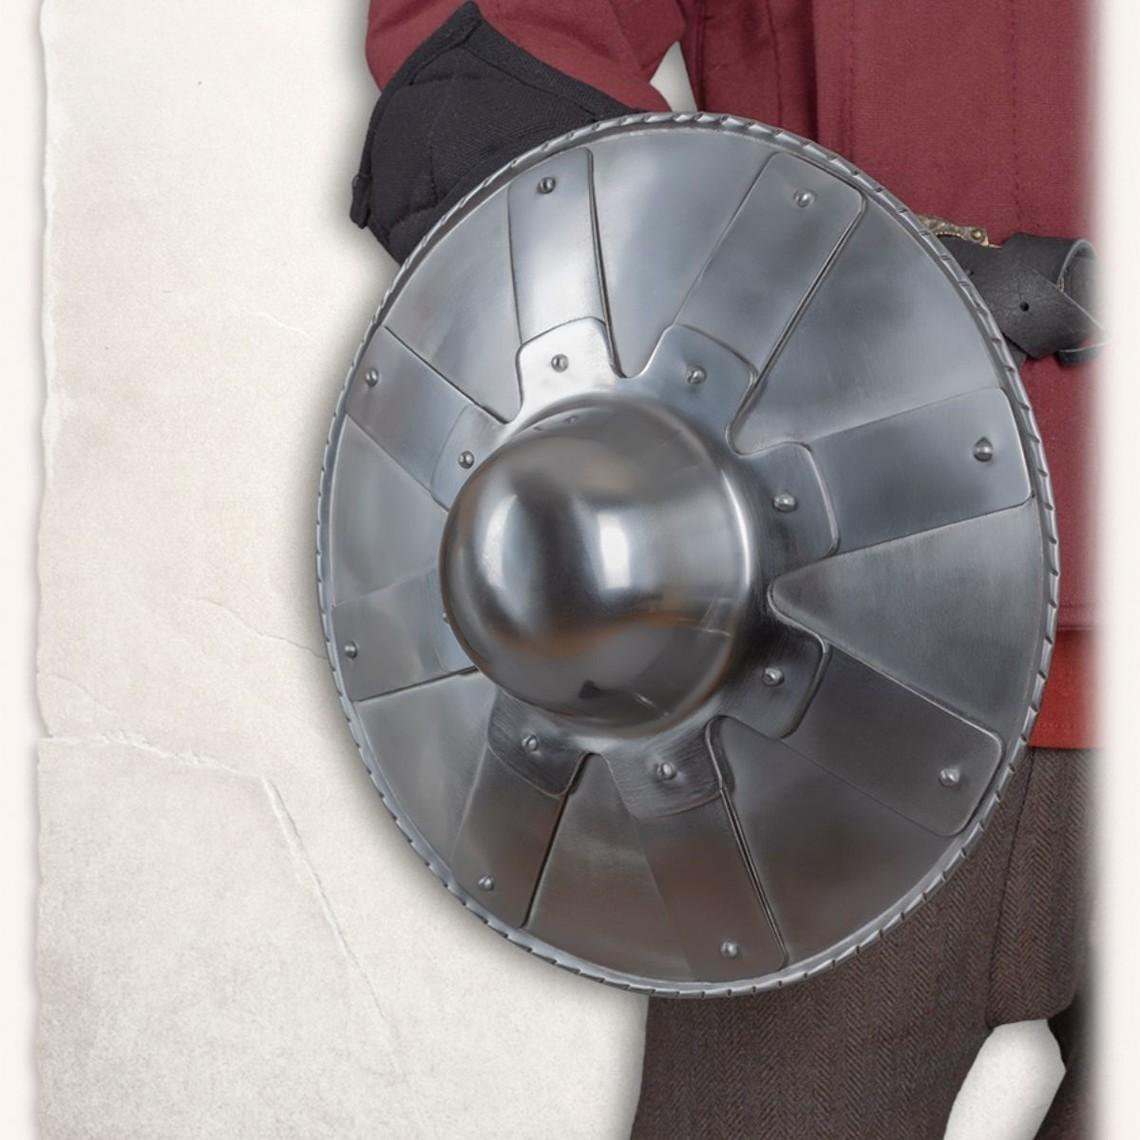 Mytholon Mittelalterliche Buckler Mercurior